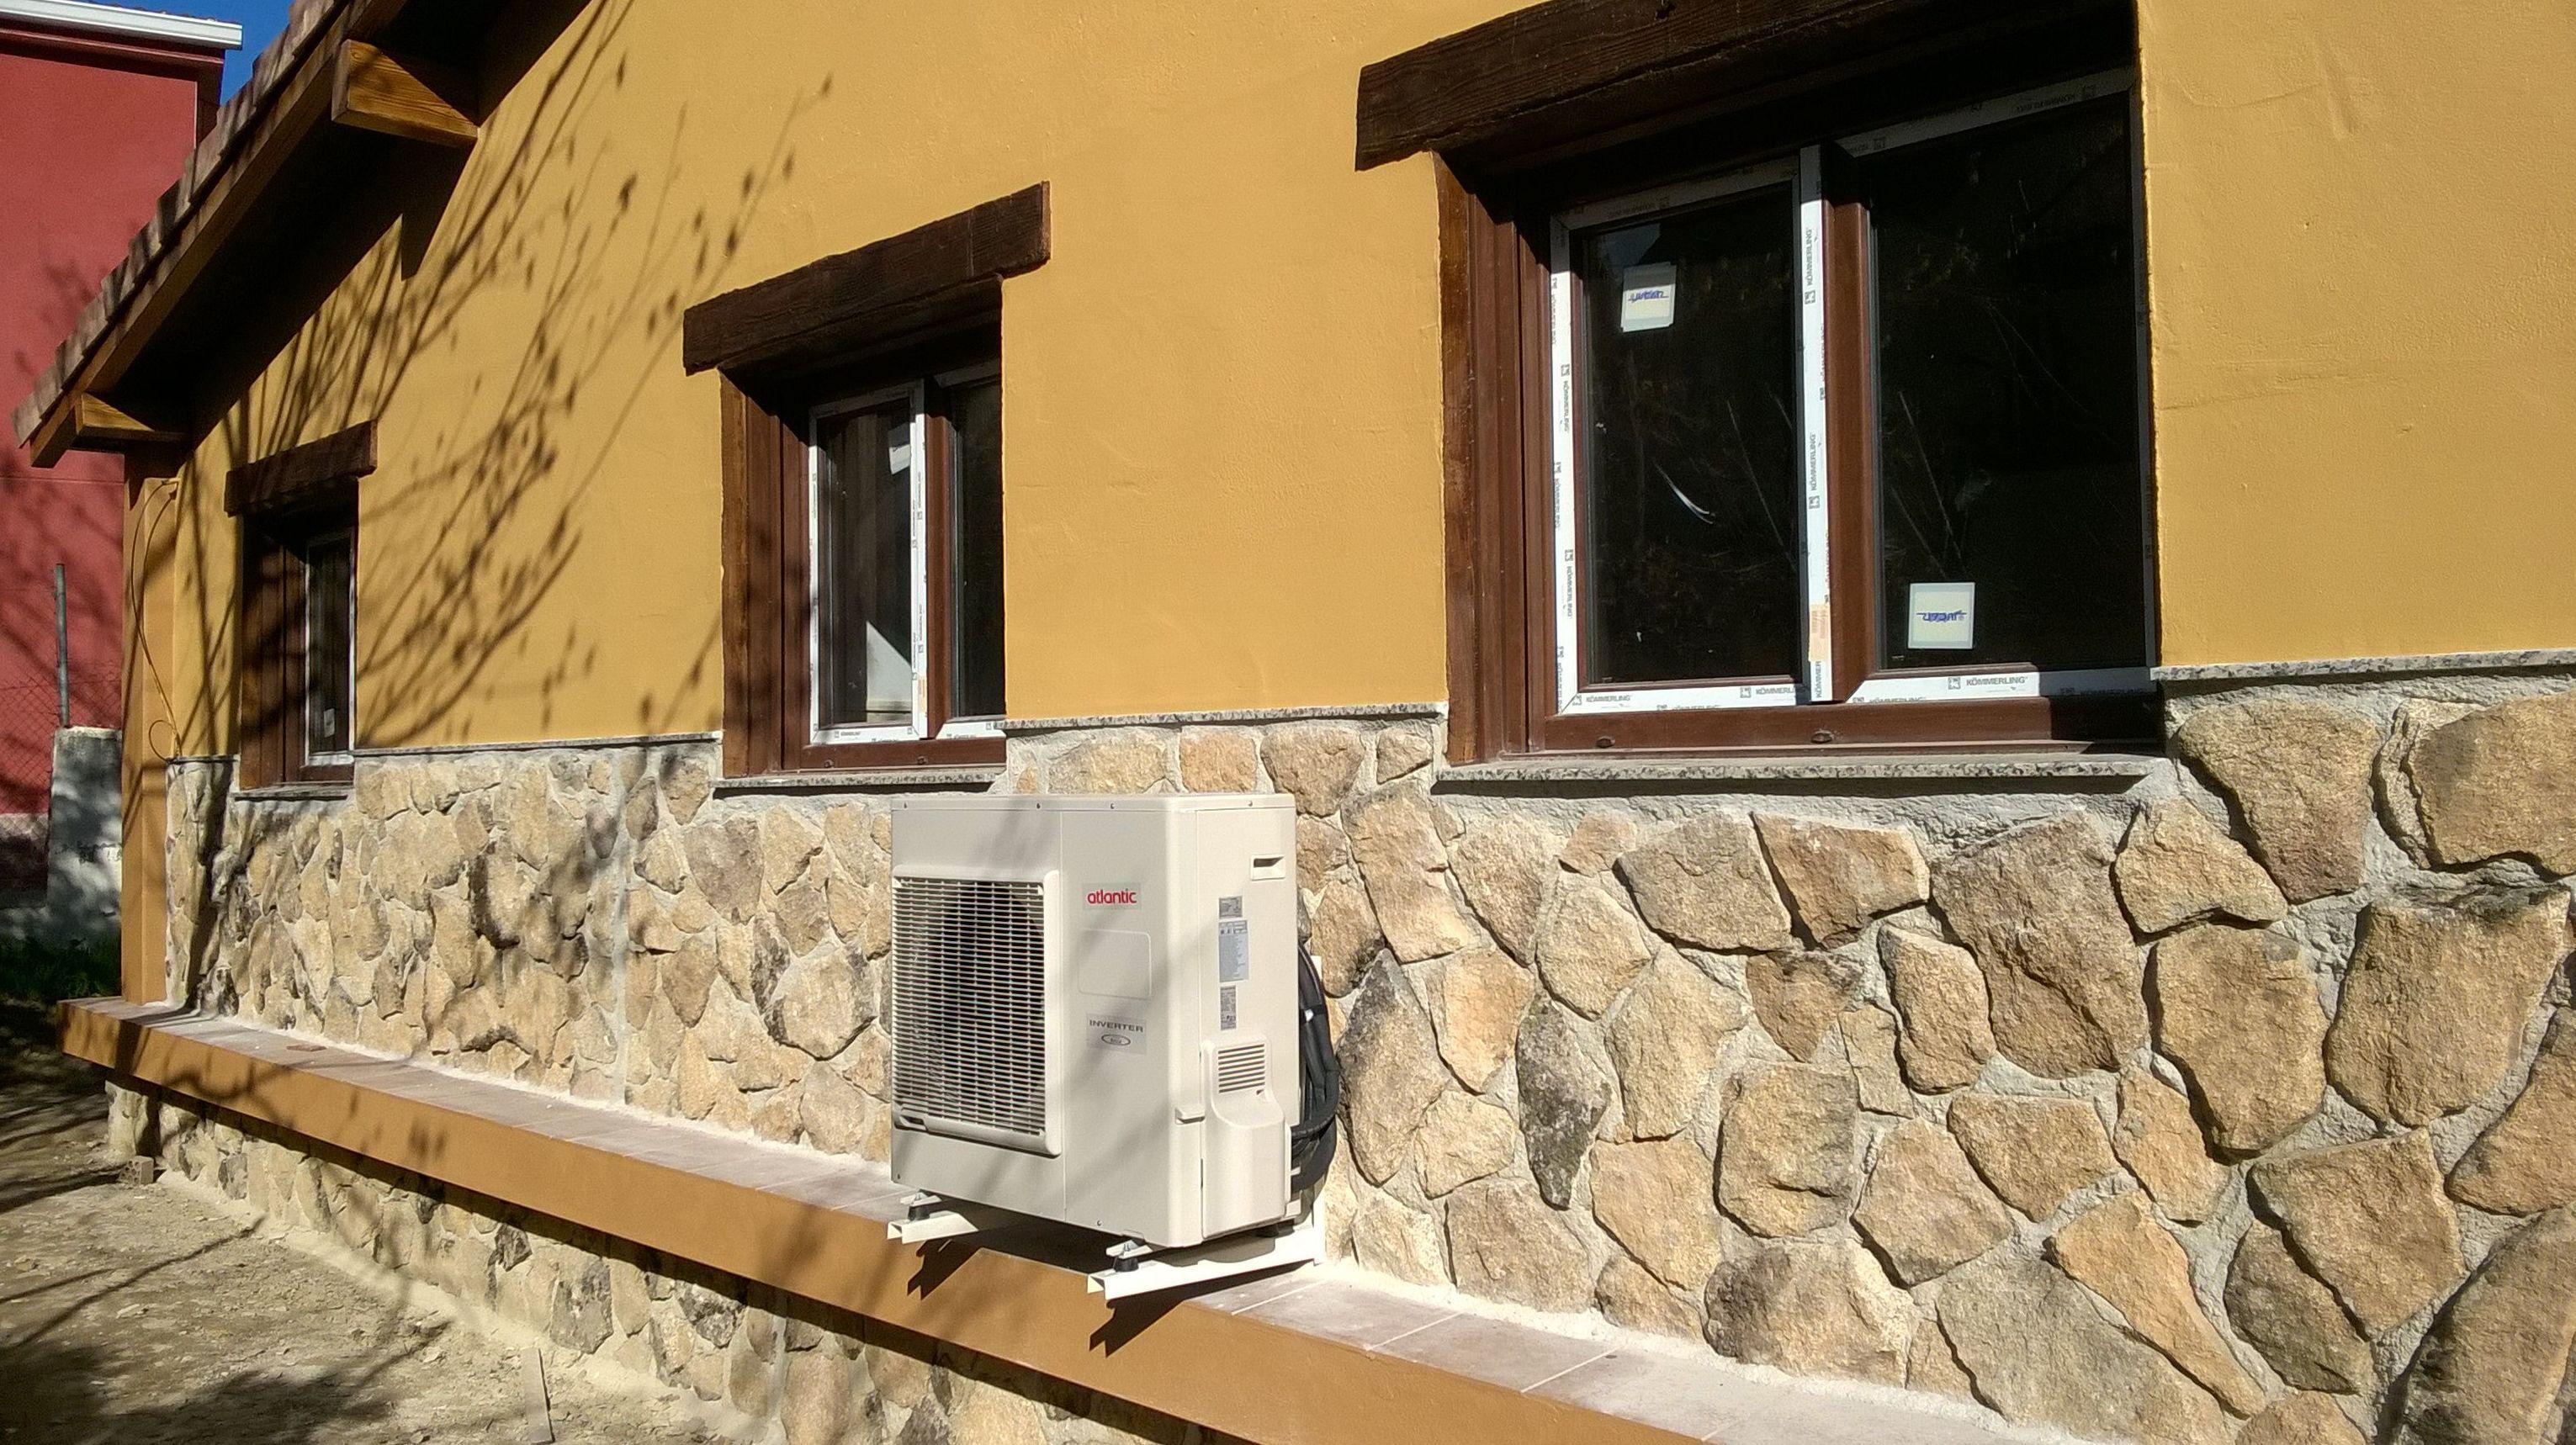 Unidad exterior aerotermia duo (calefaccion/clima + ACS)